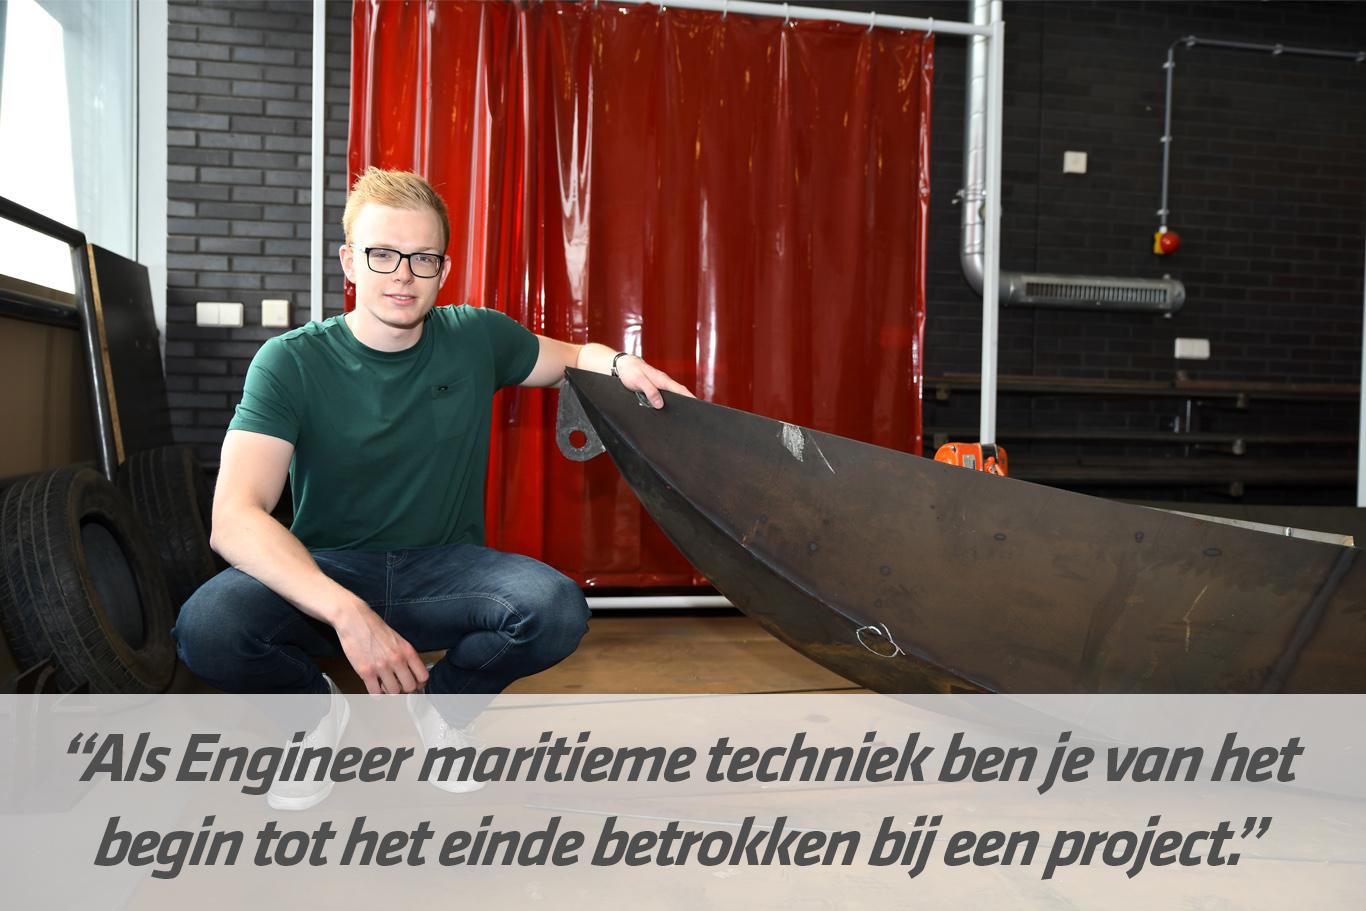 Mbo-opleiding Engineer maritieme techniek | STC mbo college Rotterdam